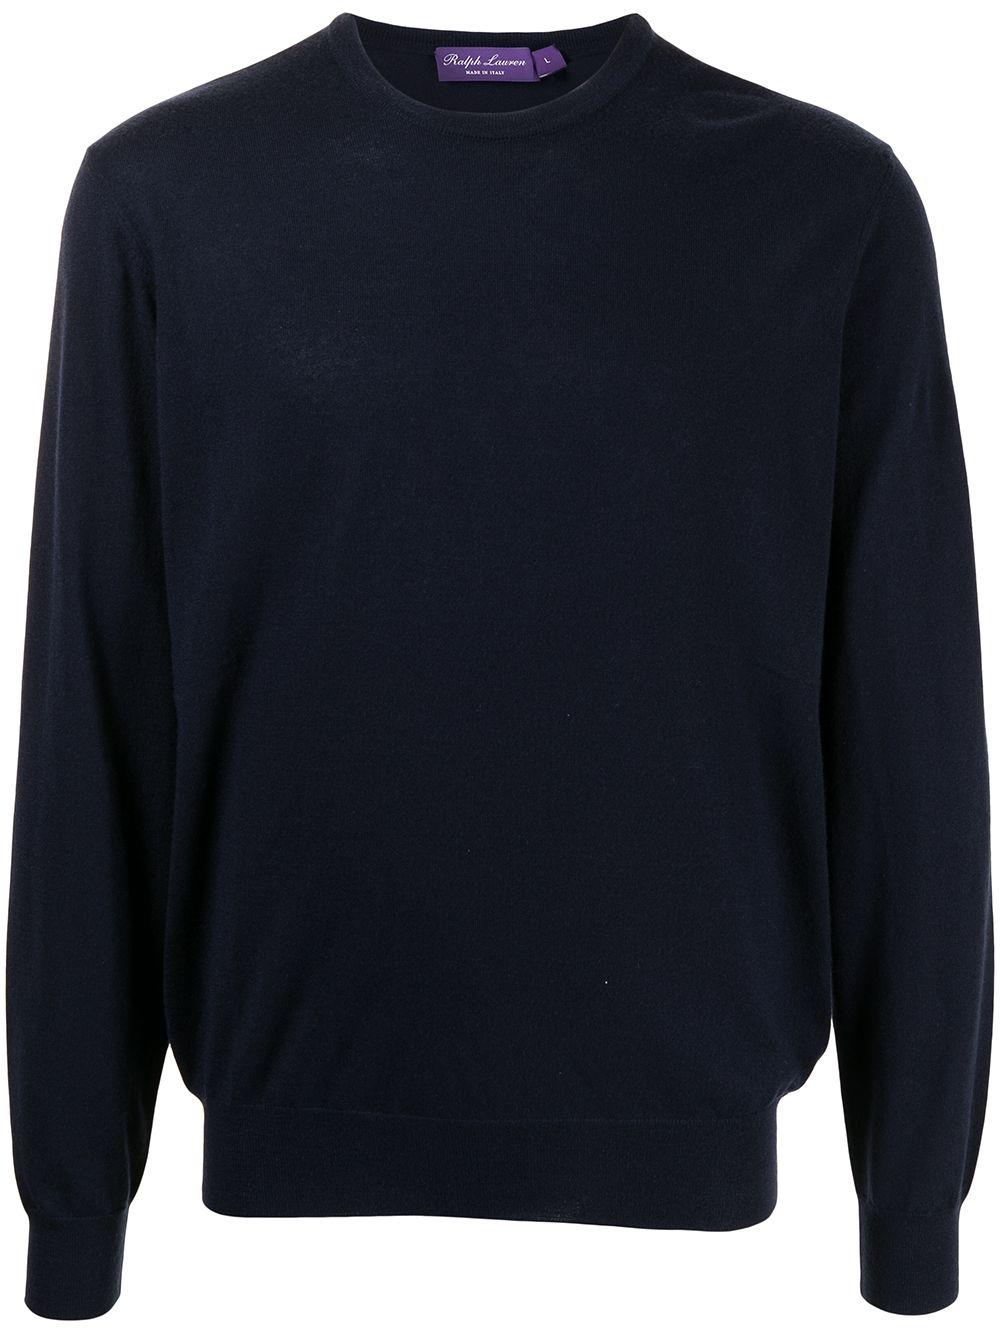 Polo Ralph Lauren long-sleeved cashmere-knit sweatshirt - Blau